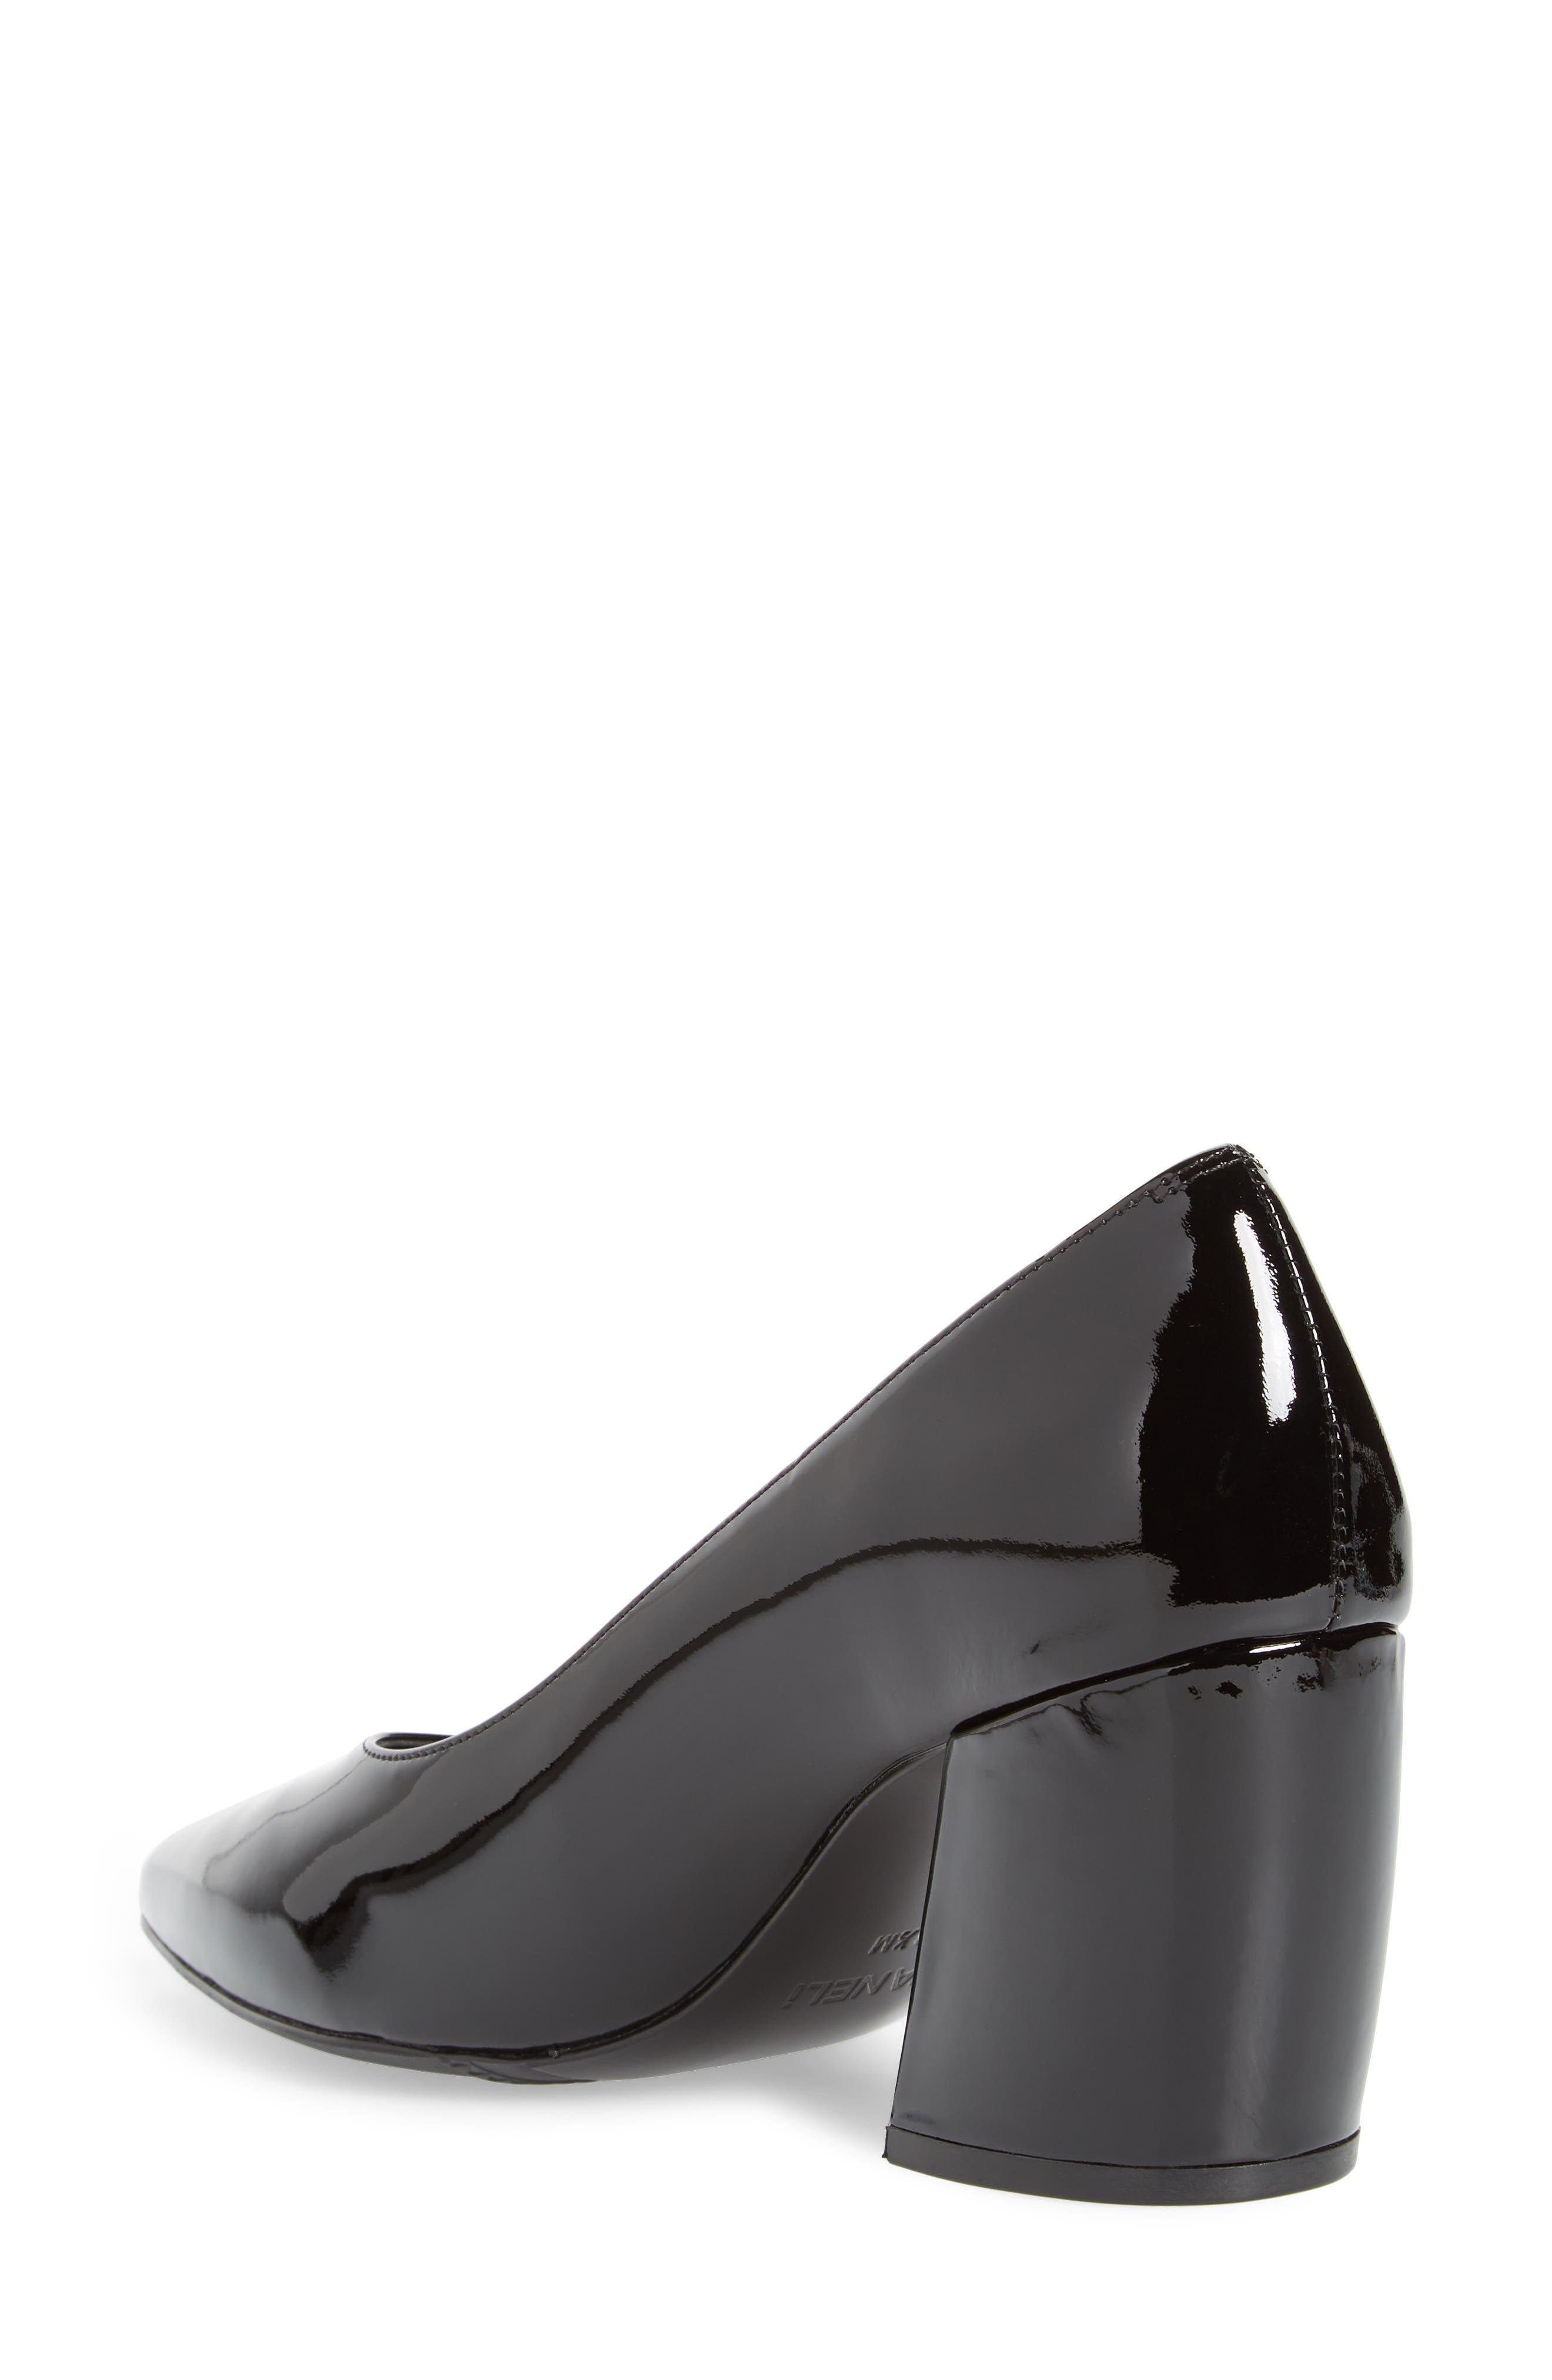 Remma Broken Heel Pump,                             Alternate thumbnail 2, color,                             Black Fabric